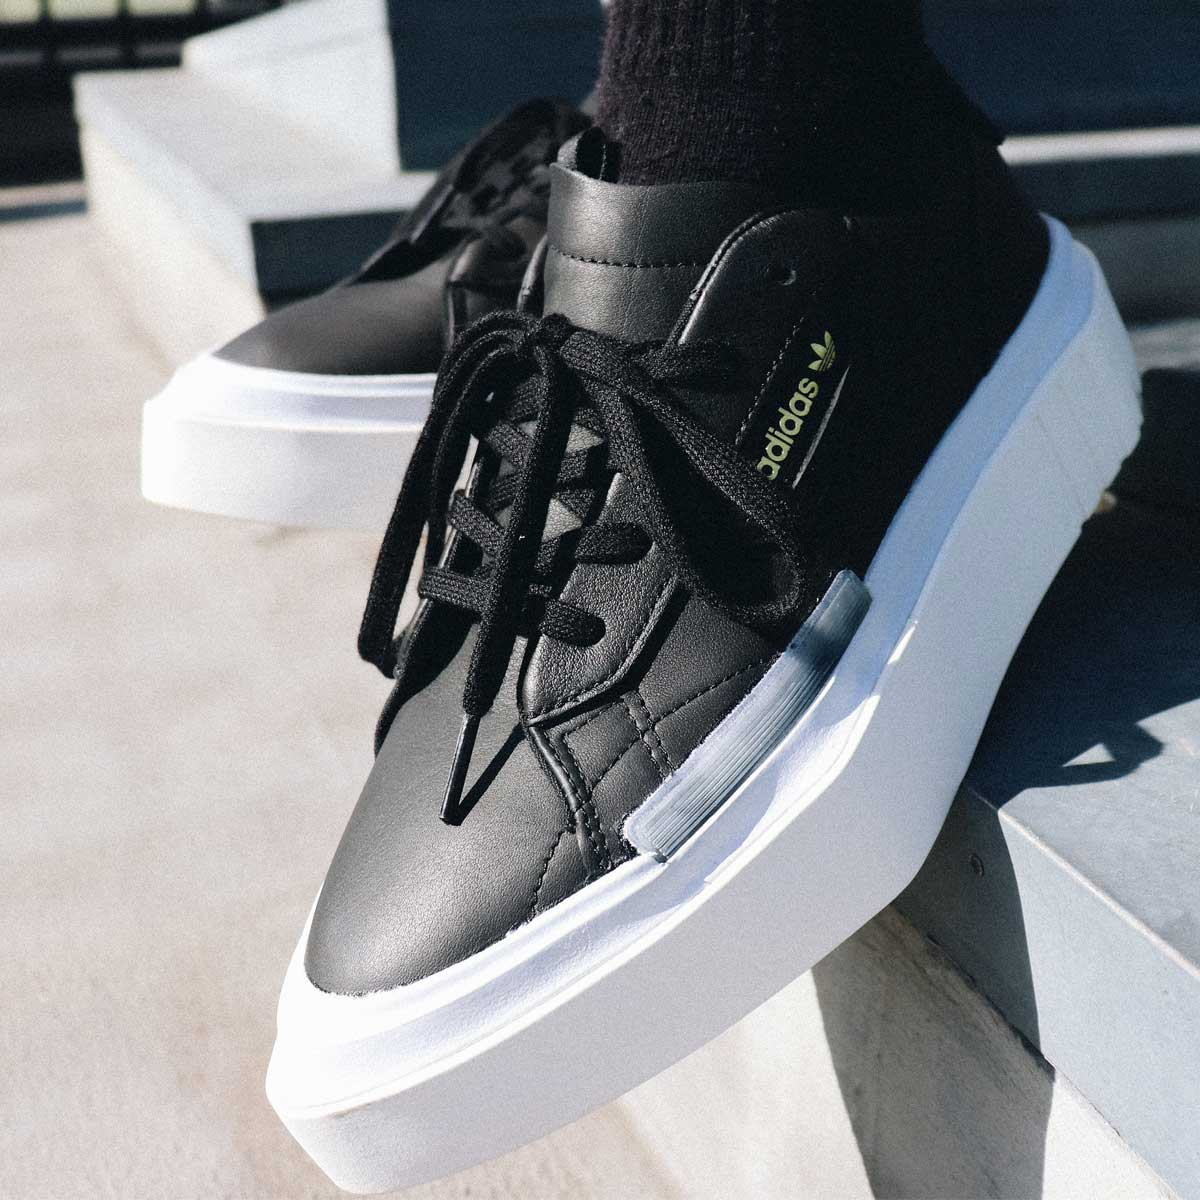 adidas Originals adidas HYPERSLEEK W(アディダスオリジナルス ハイパースリーク W)CORE BLACK/CORE BLACK/AERO BLUE【メンズ レディース スニーカー】19SS-I